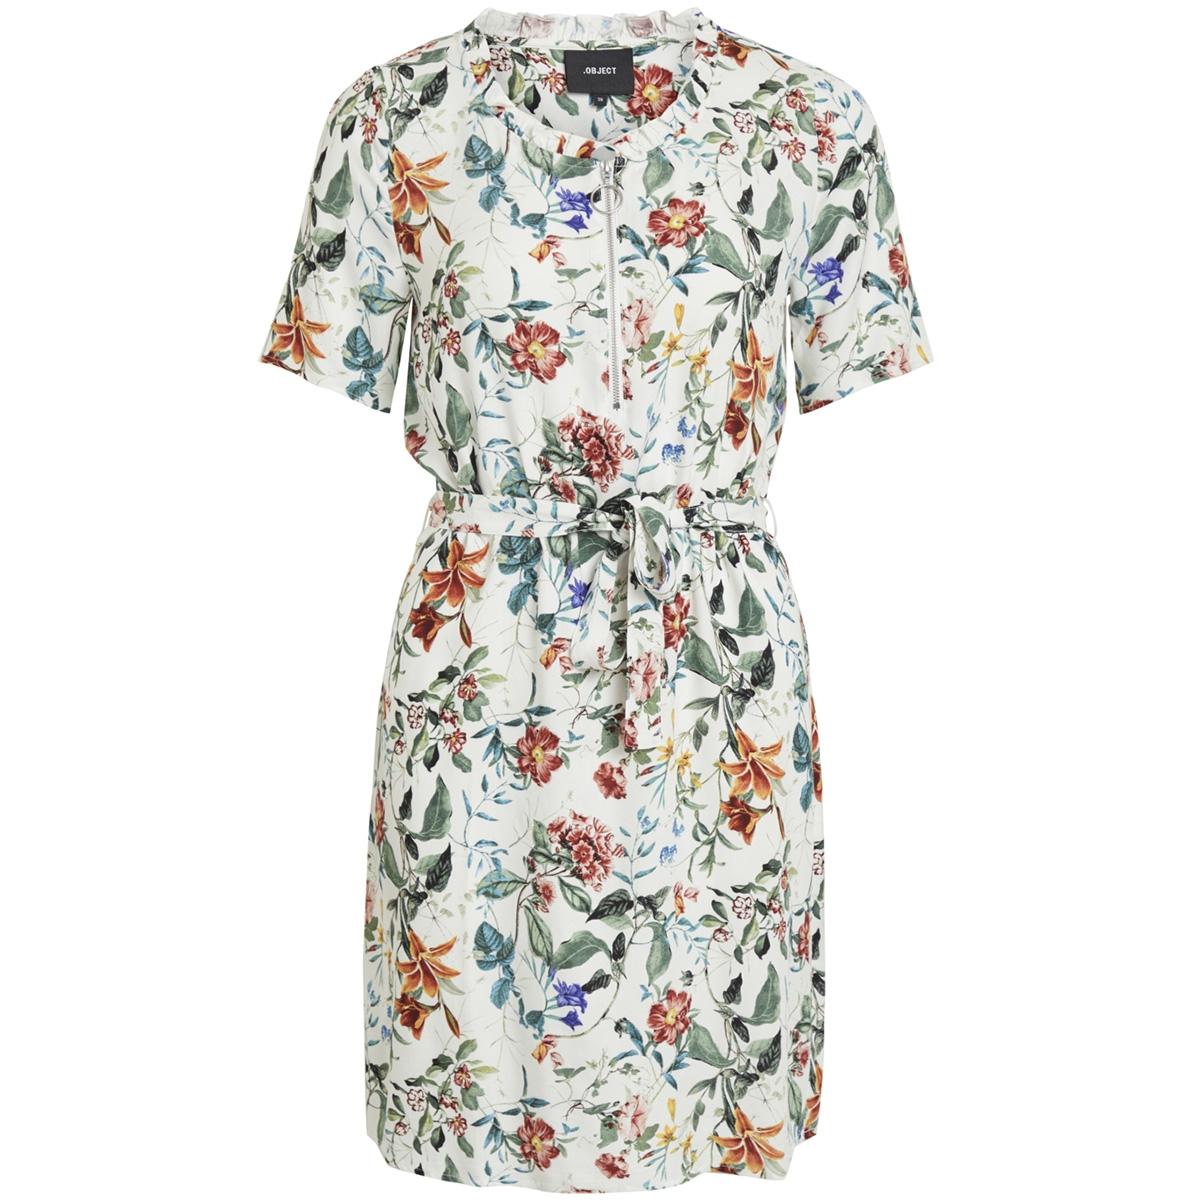 objamber haidy dress 102 div 23029883 object jurk gardenia